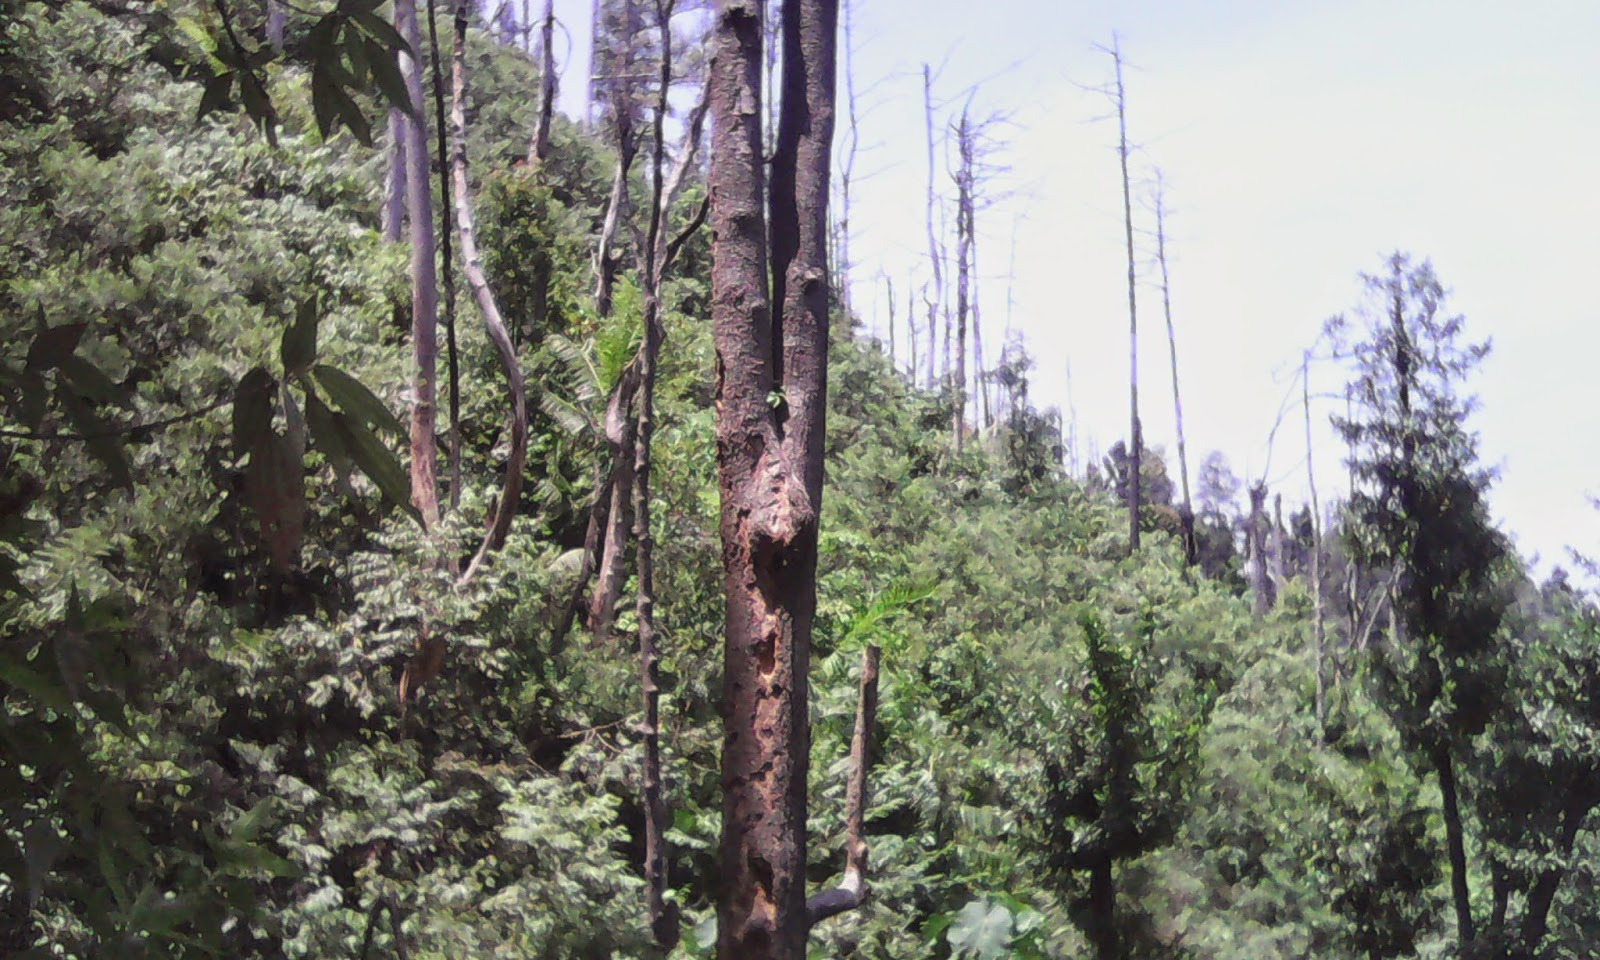 Mendaki Bukit Pronojiwo di Kabupaten Sleman, Yogyakarta